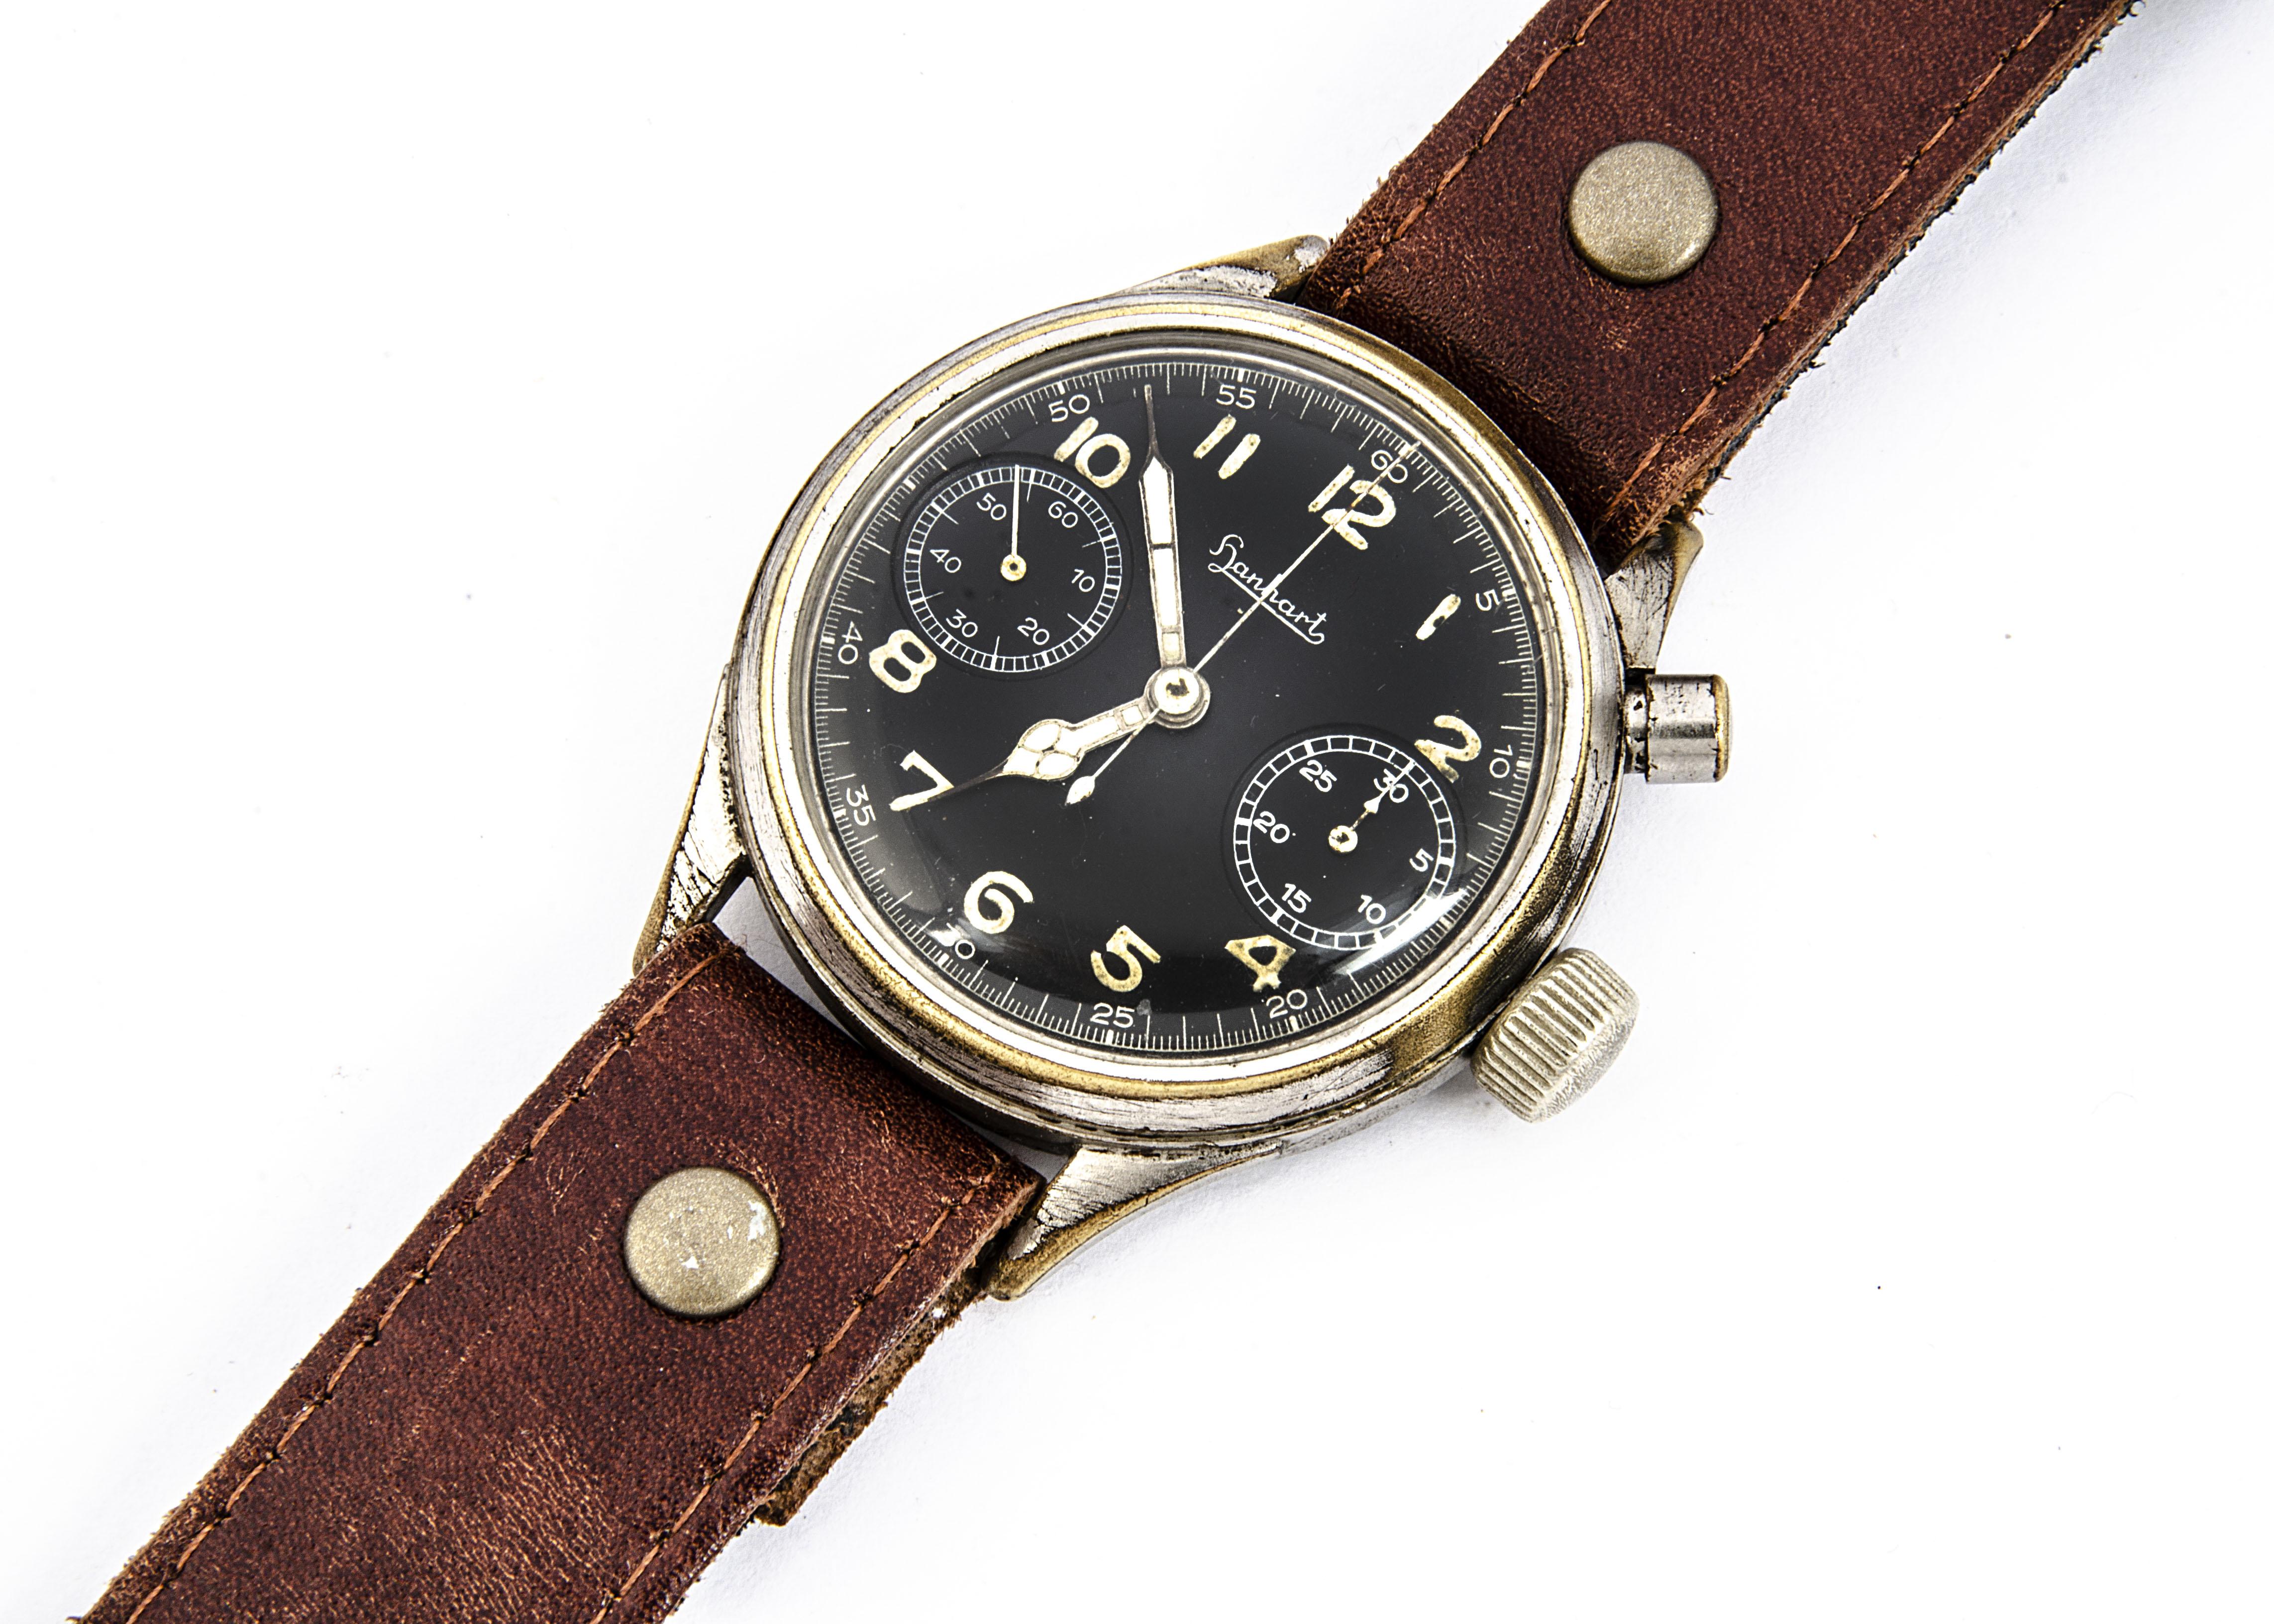 A WWII period Hanhart German Luftwaffe chronograph wristwatch, 40mm plated nickel case, running, - Image 3 of 6